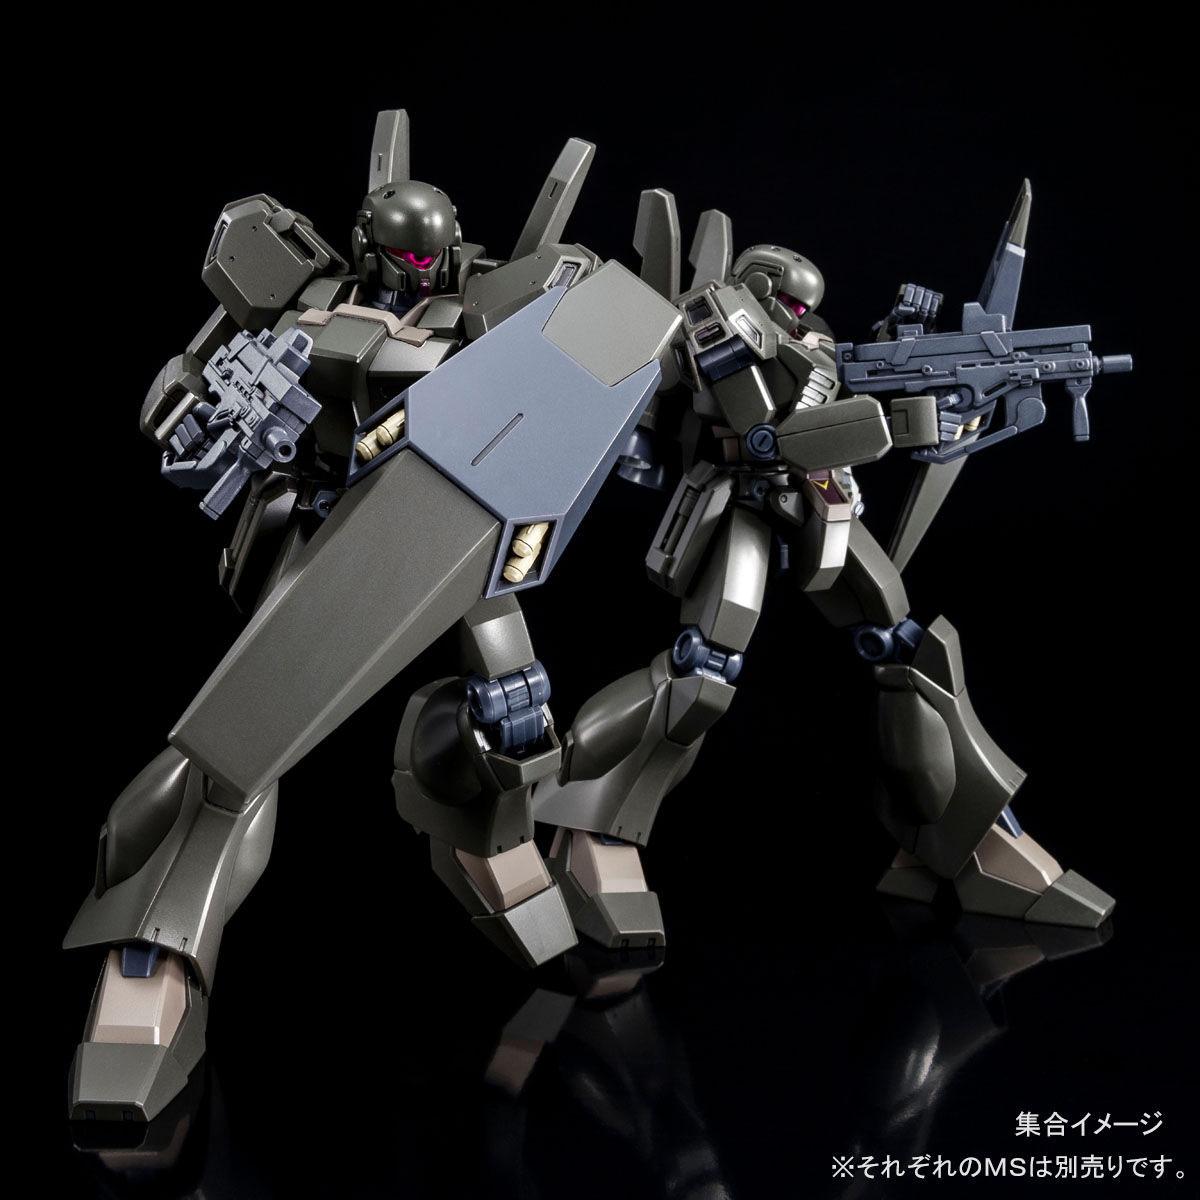 HG 1/144『ジェガンD型 (護衛隊仕様)』機動戦士ガンダムNT プラモデル-009